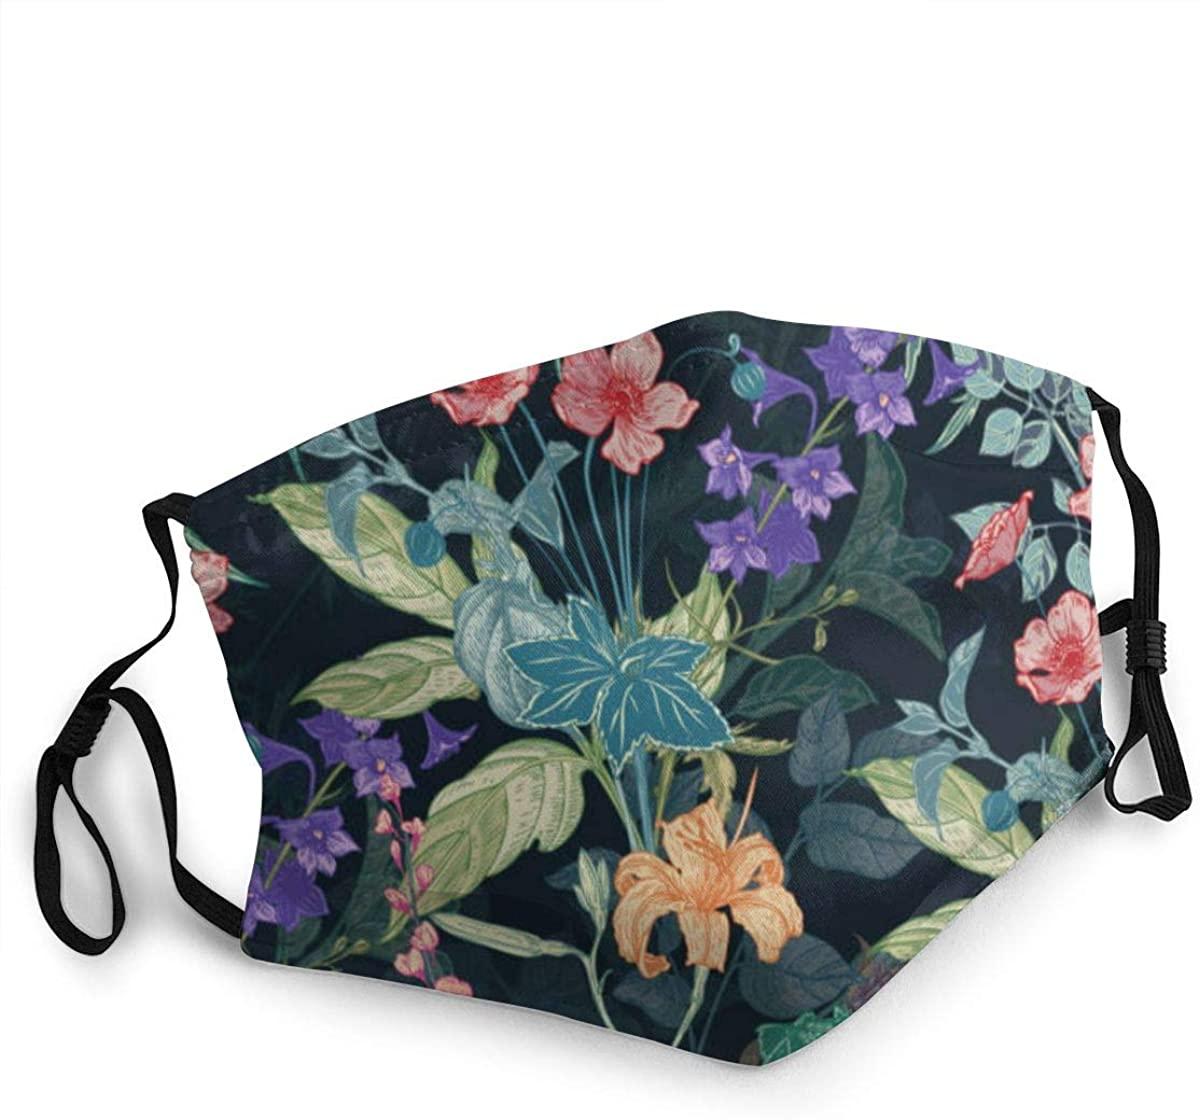 Fashion Protective Face Masks, Vintage Detailed Flowers() Unisex Dust Mouth Masks, Washable, Reusable Masks